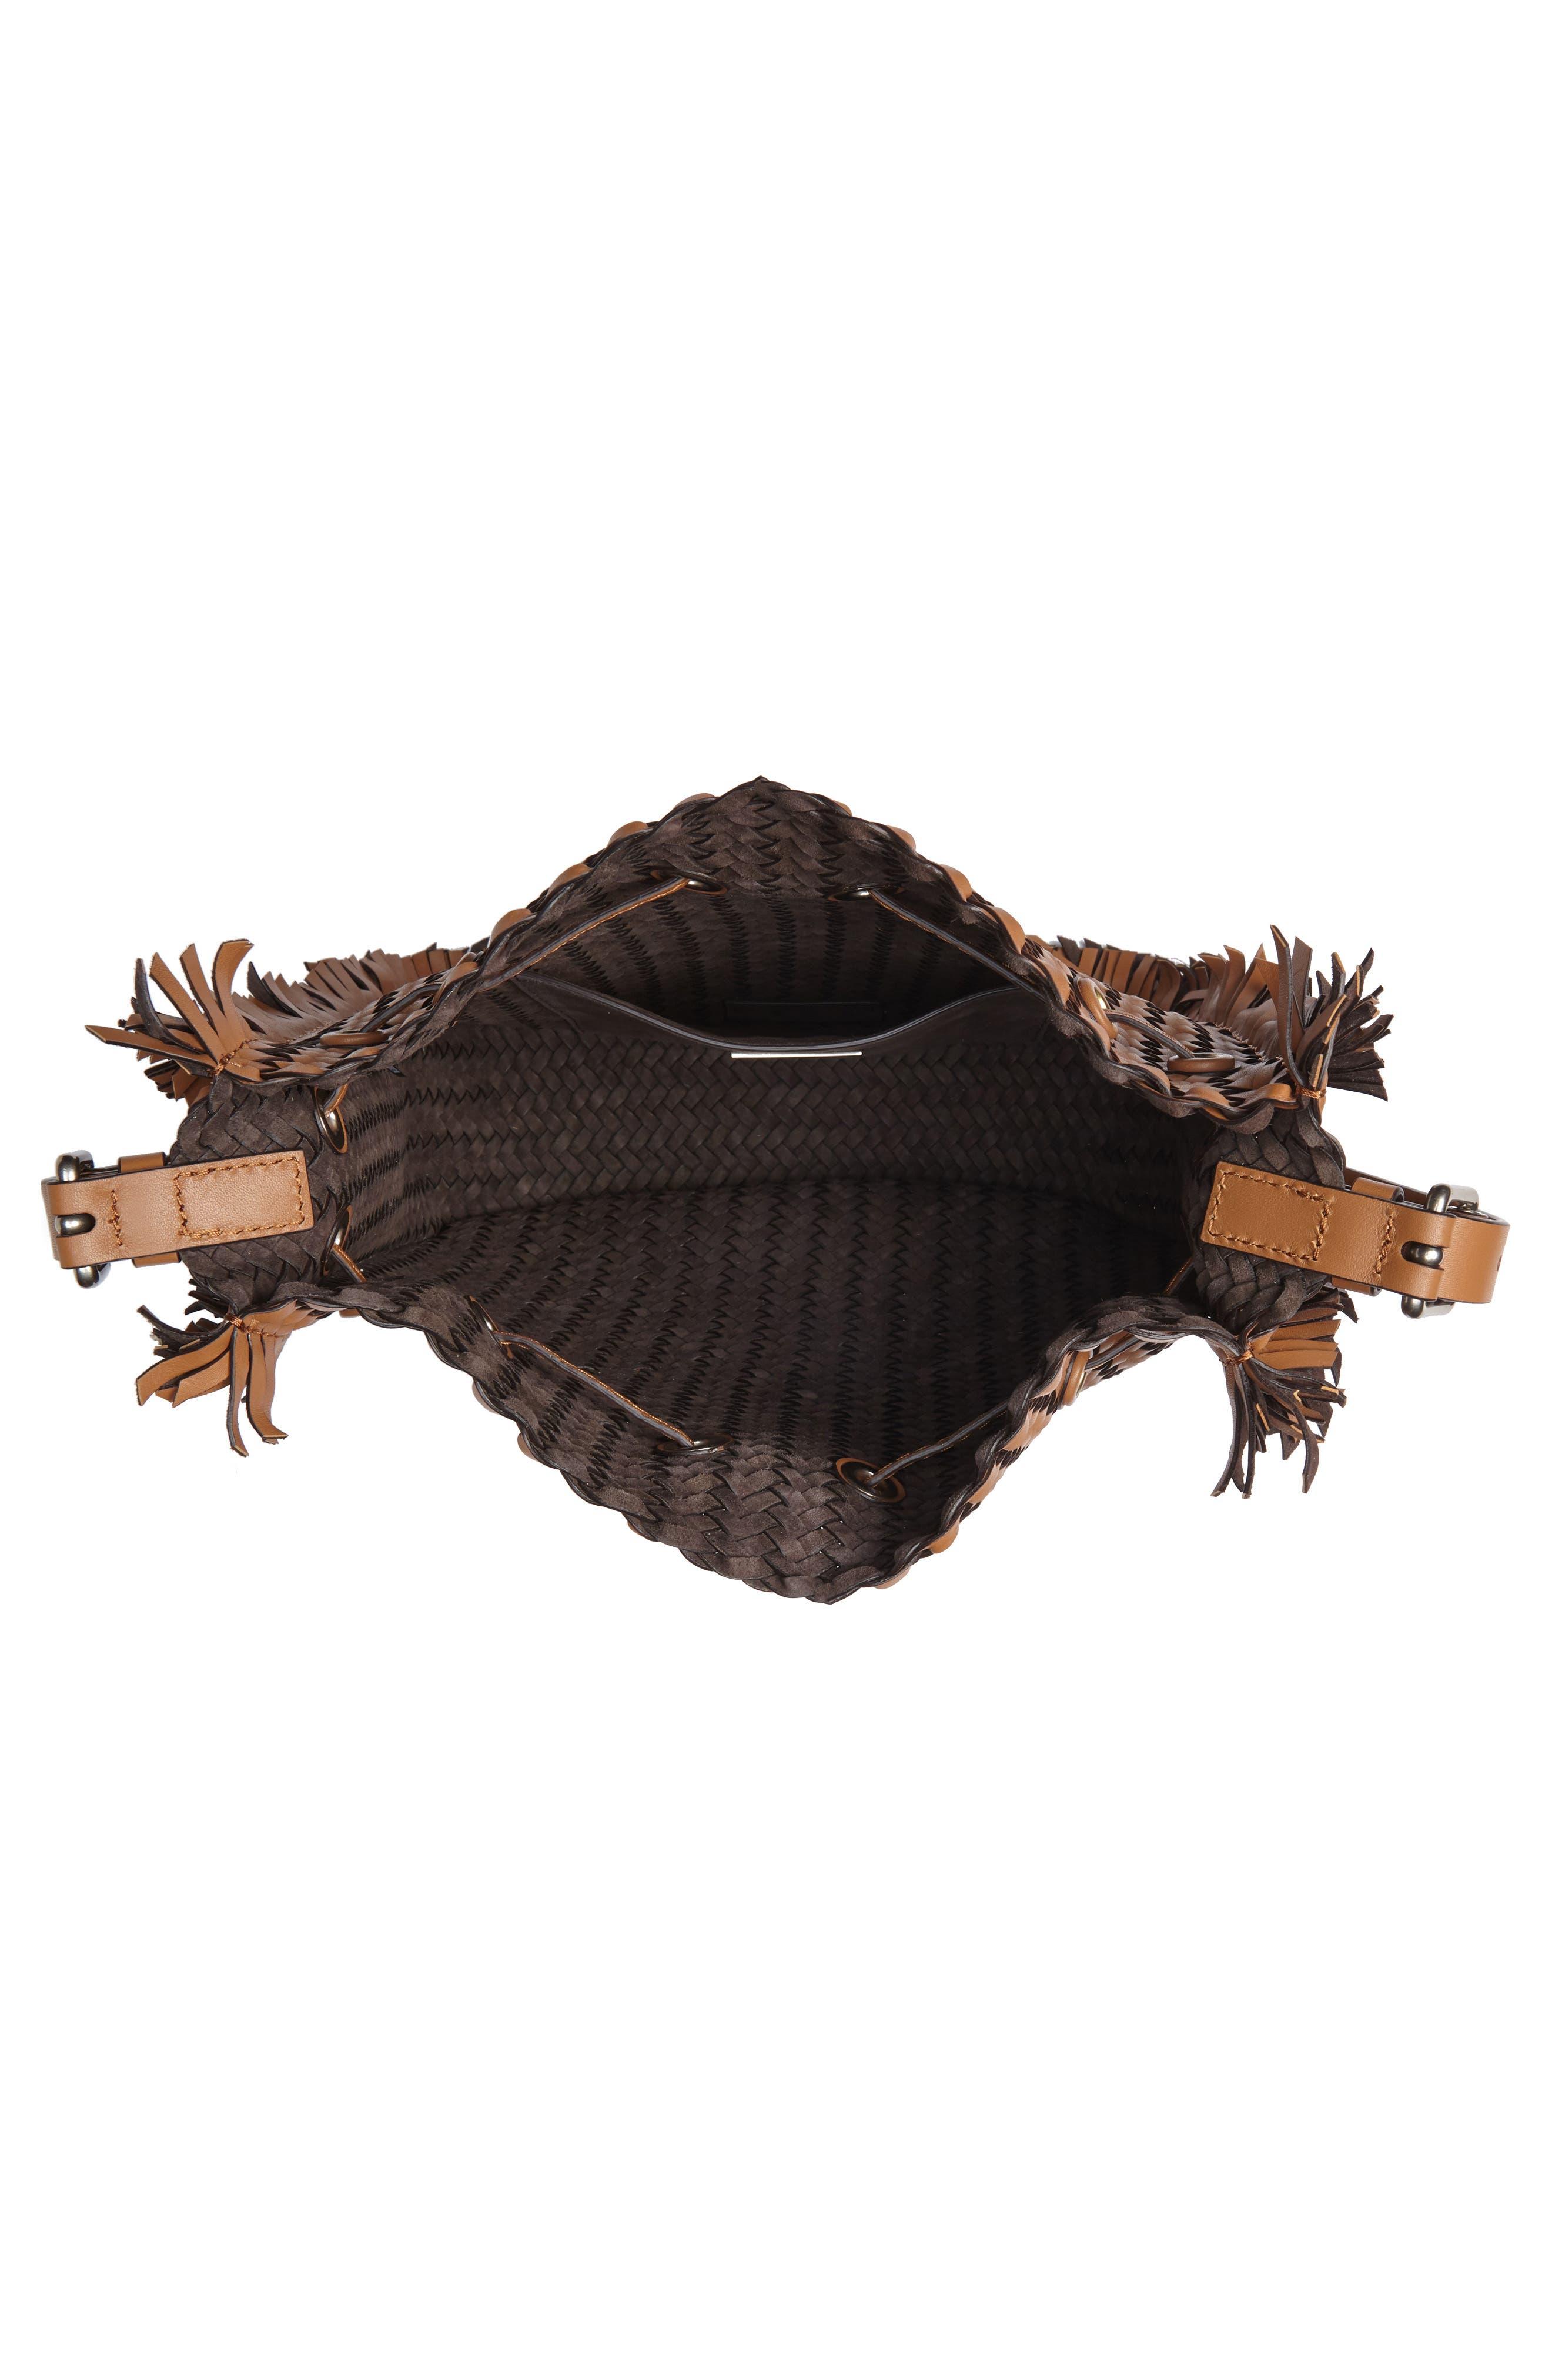 Maldives Woven Frayed Leather Crossbody Bag,                             Alternate thumbnail 4, color,                             231